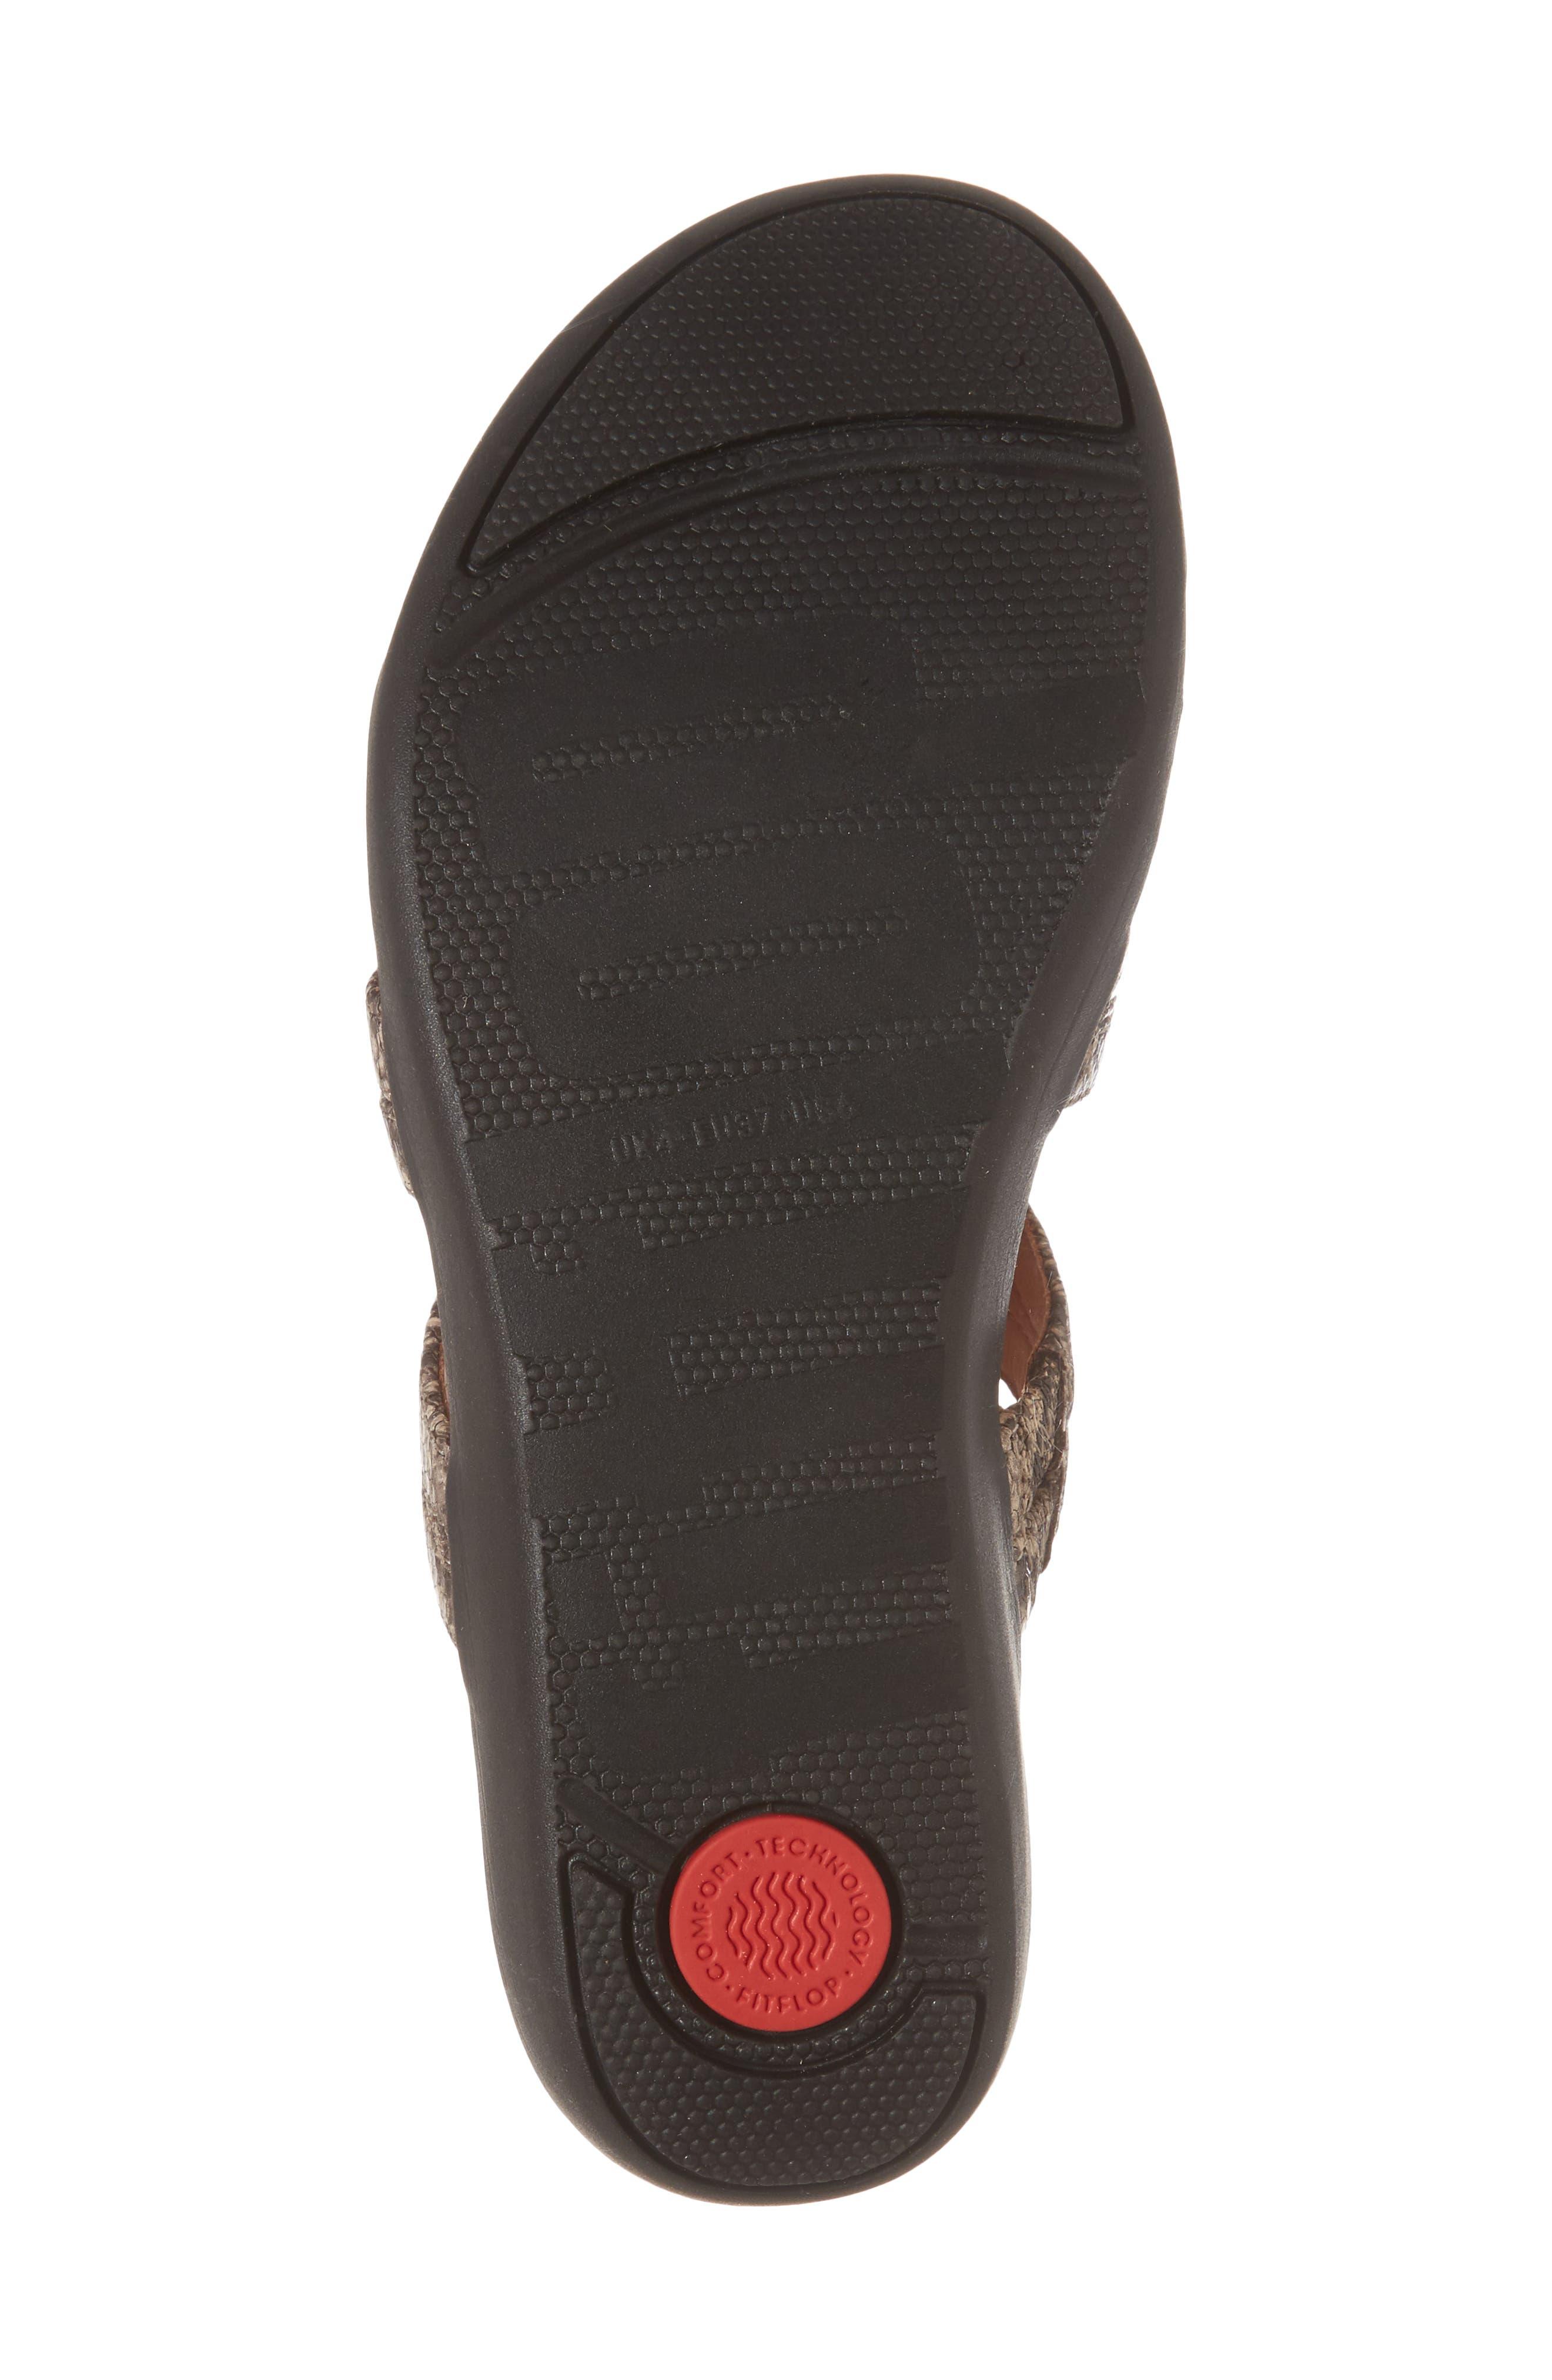 Strata Gladiator Sandal,                             Alternate thumbnail 6, color,                             Taupe Snake Print Leather